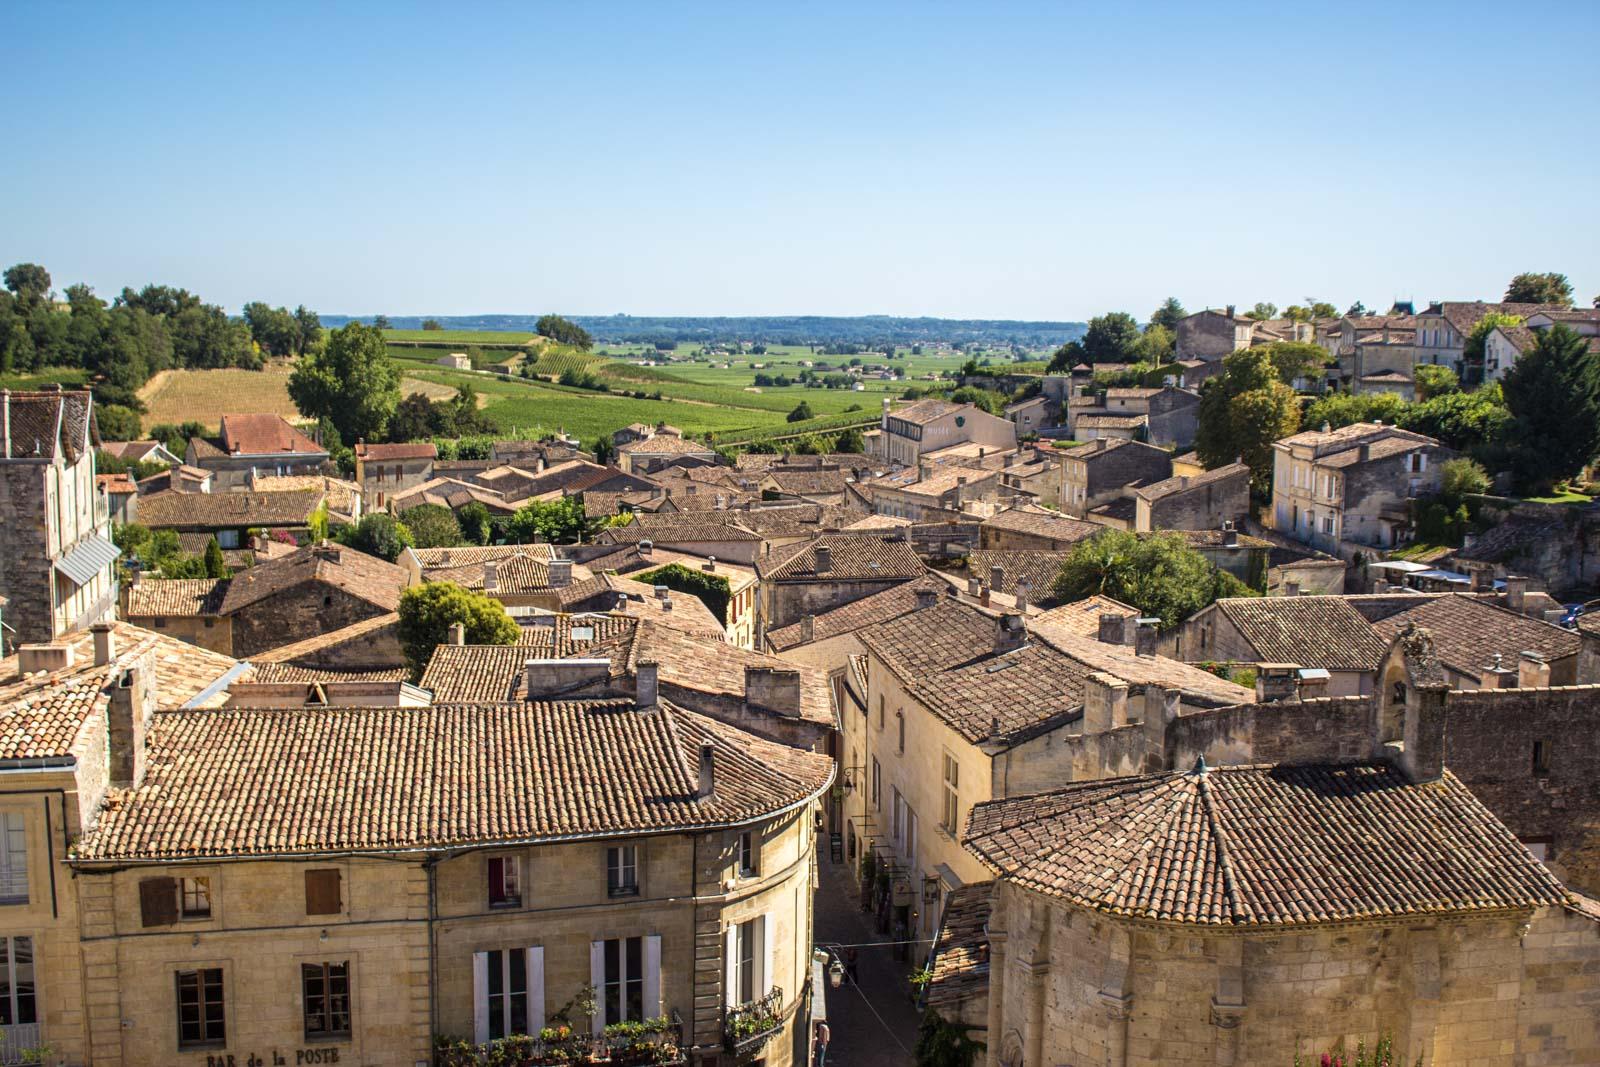 Vineyards of Saint-Emilion, France